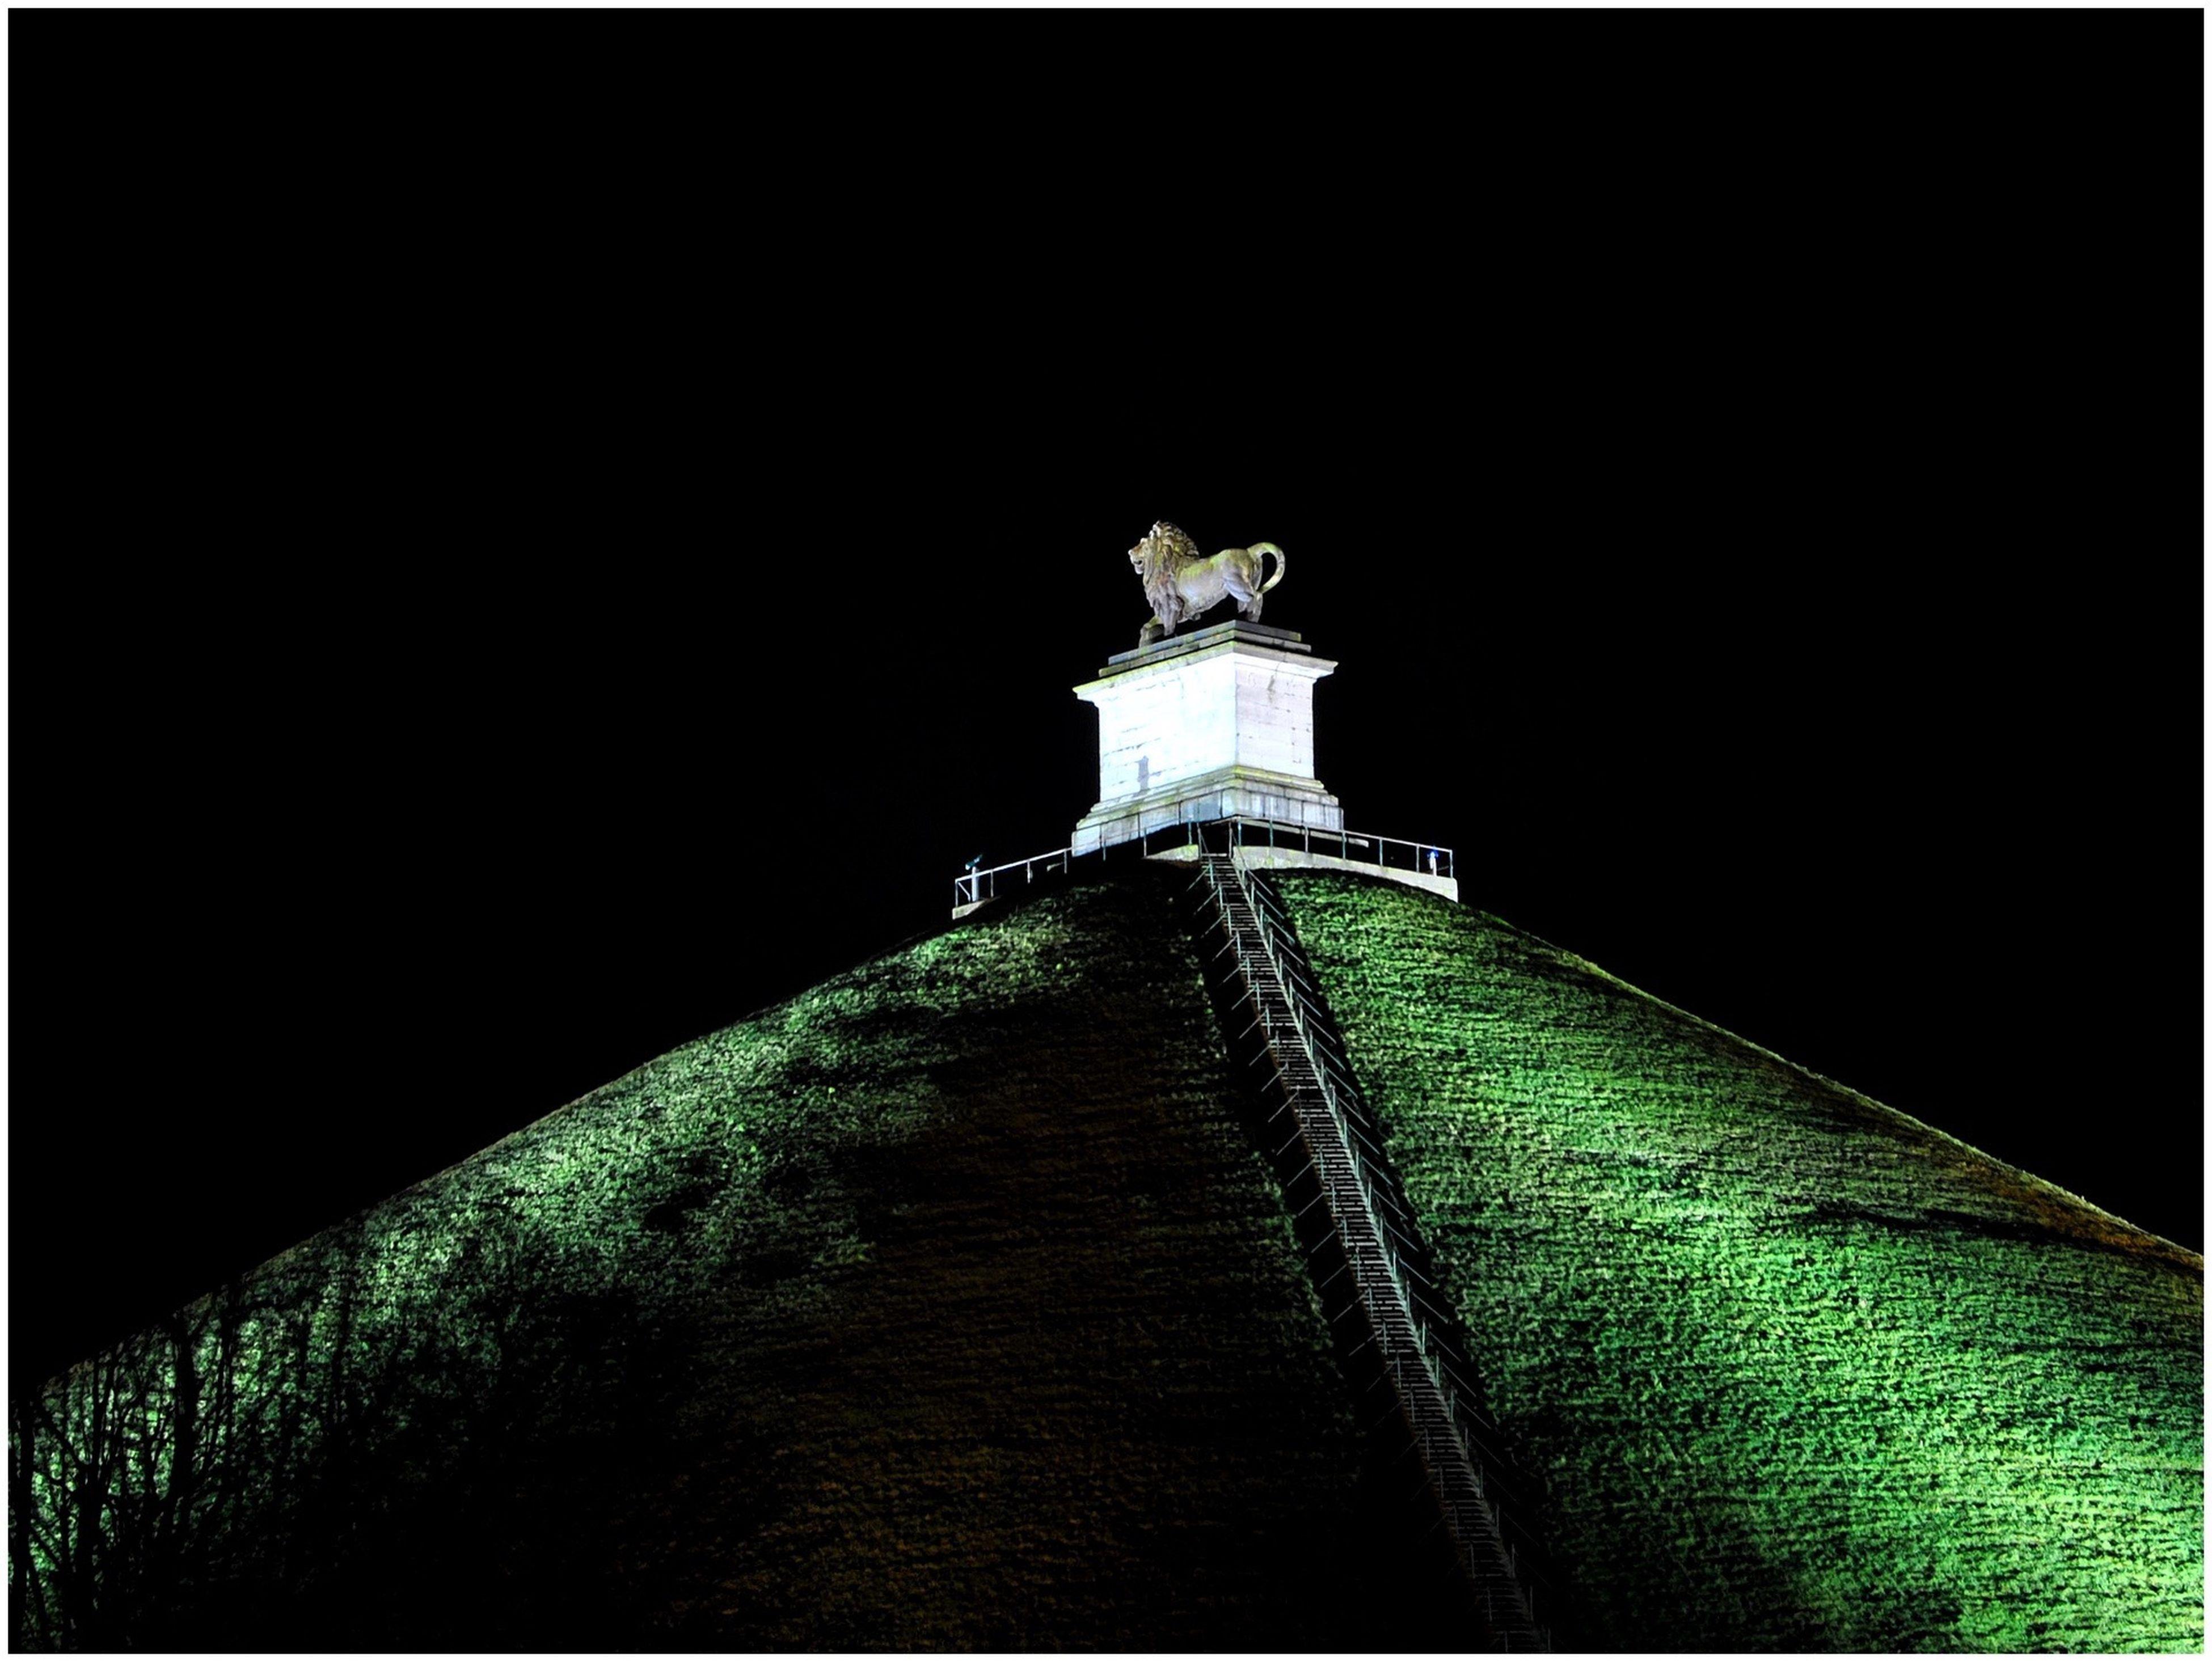 Waterloo Lion's Mound Butte Du Lion Lion Of Waterloo Taking Photos Nightphotography Night Photography Nikon D3000 Belgium. Belgique. Belgie. Belgien. Etc. Night Lights Historical Sights Historical Monuments EyeEm Gallery Braine-l'alleud, Monuments Monument Historique